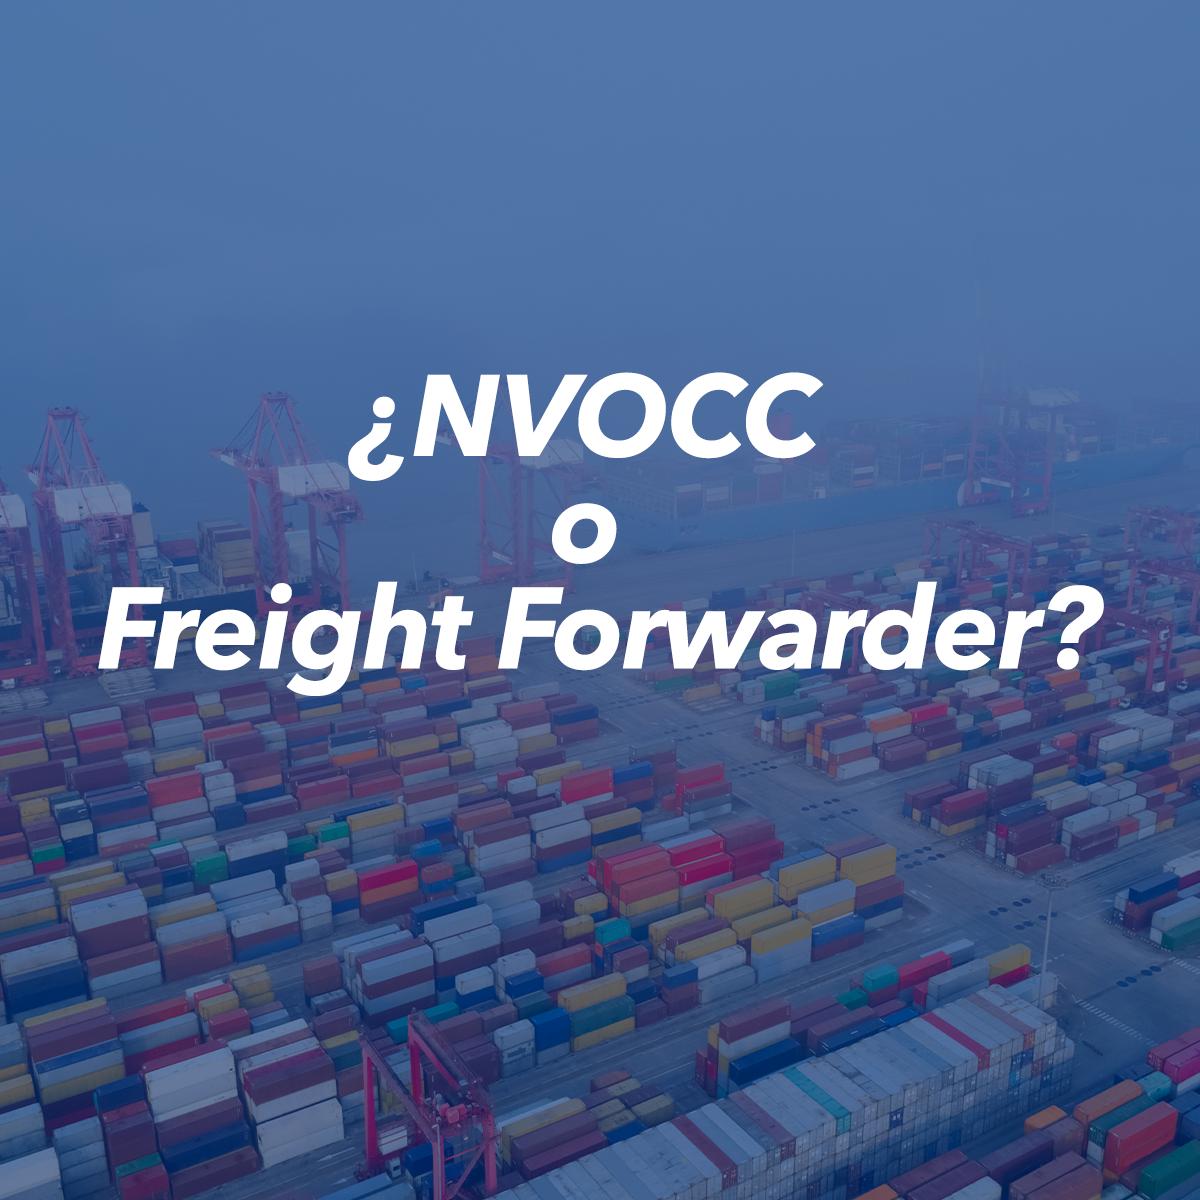 NVOCC-o-Freight-Forwarder-